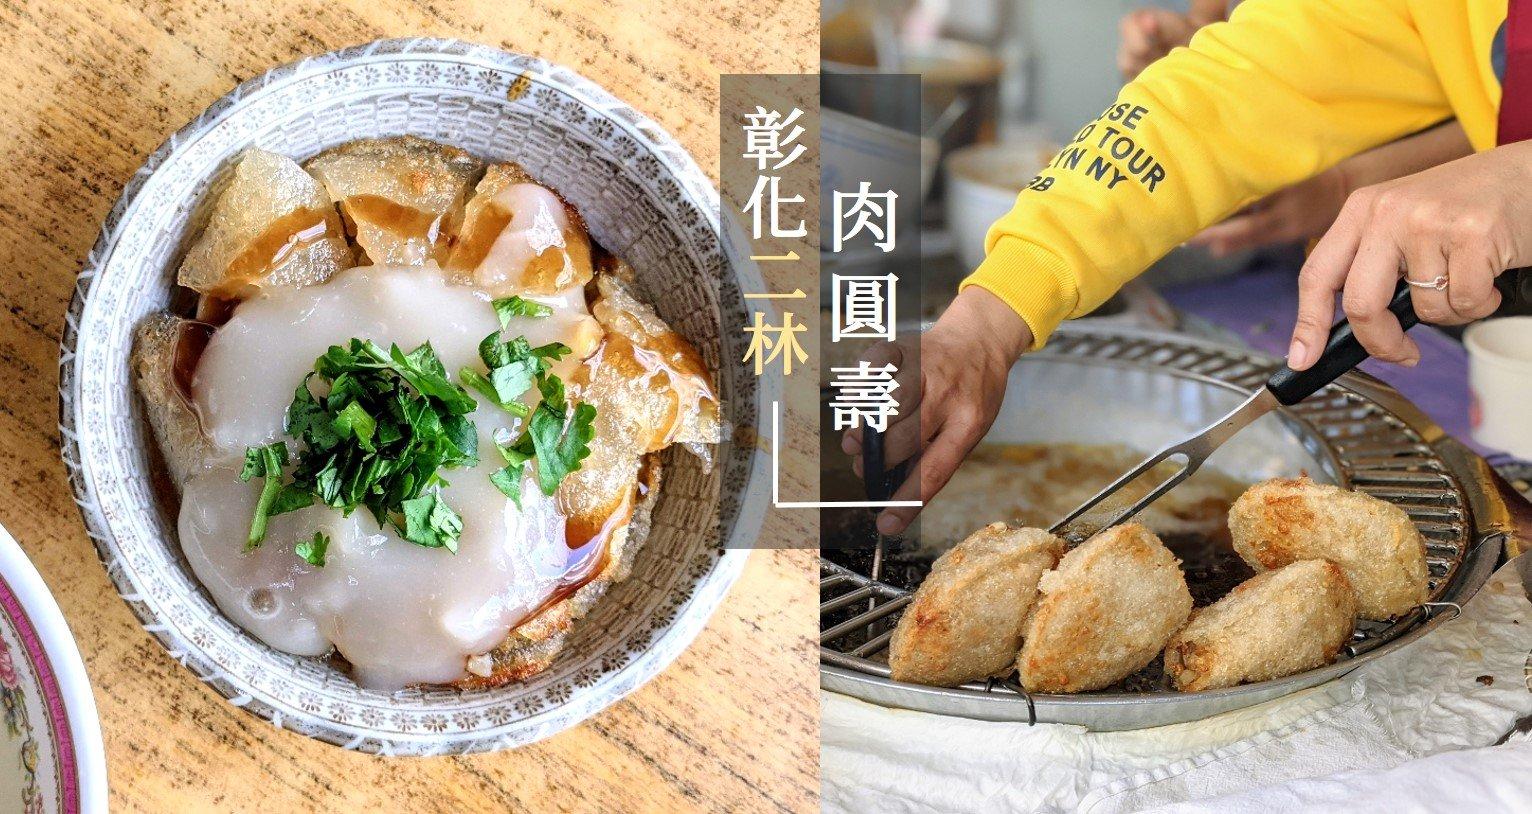 You are currently viewing 【二林美食】肉圓壽|傳承三代美味酥炸肉圓,美食節目推薦必吃